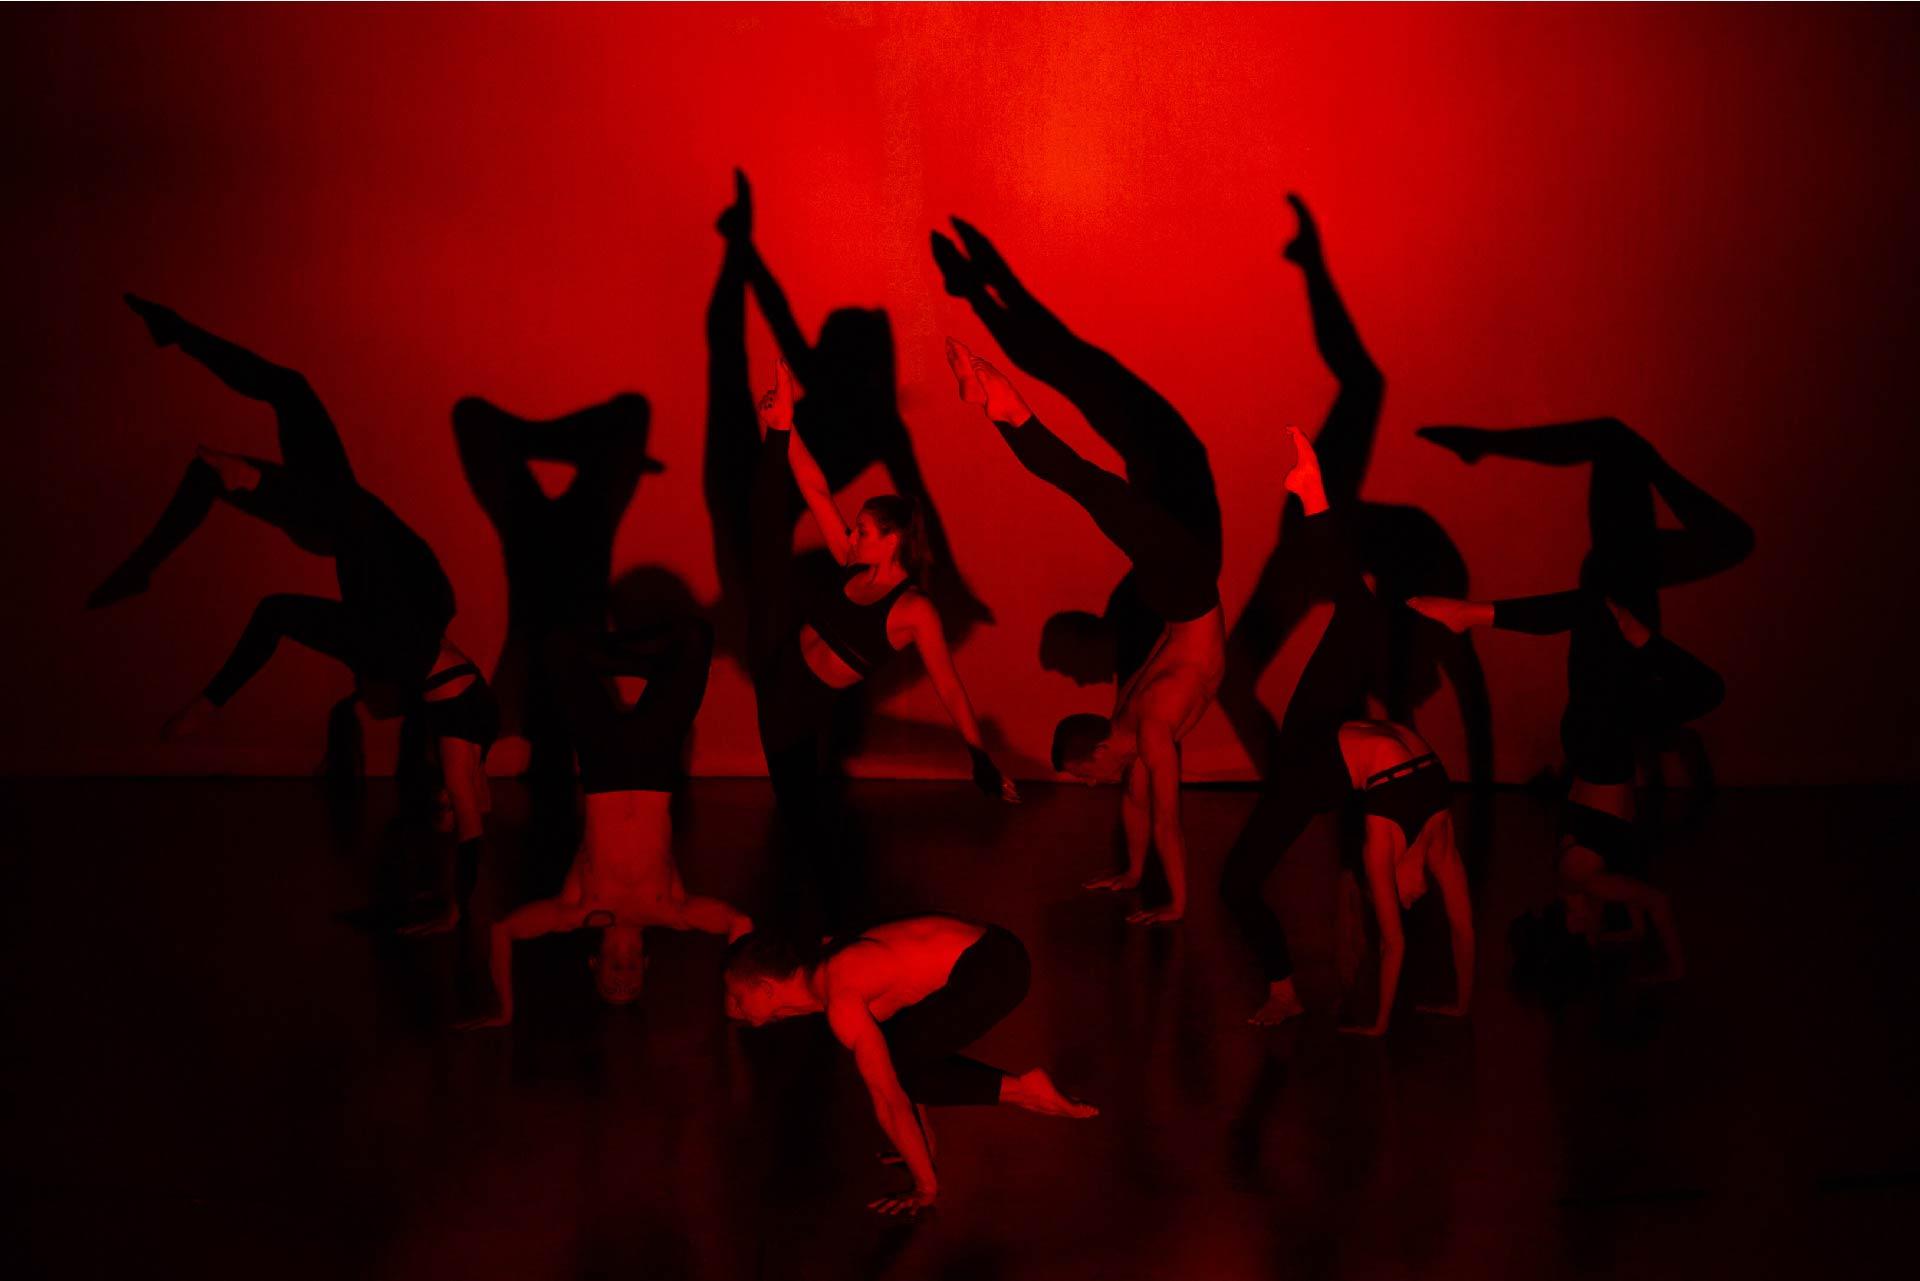 3D театр теней shadow show 3D 3Д театр тіней